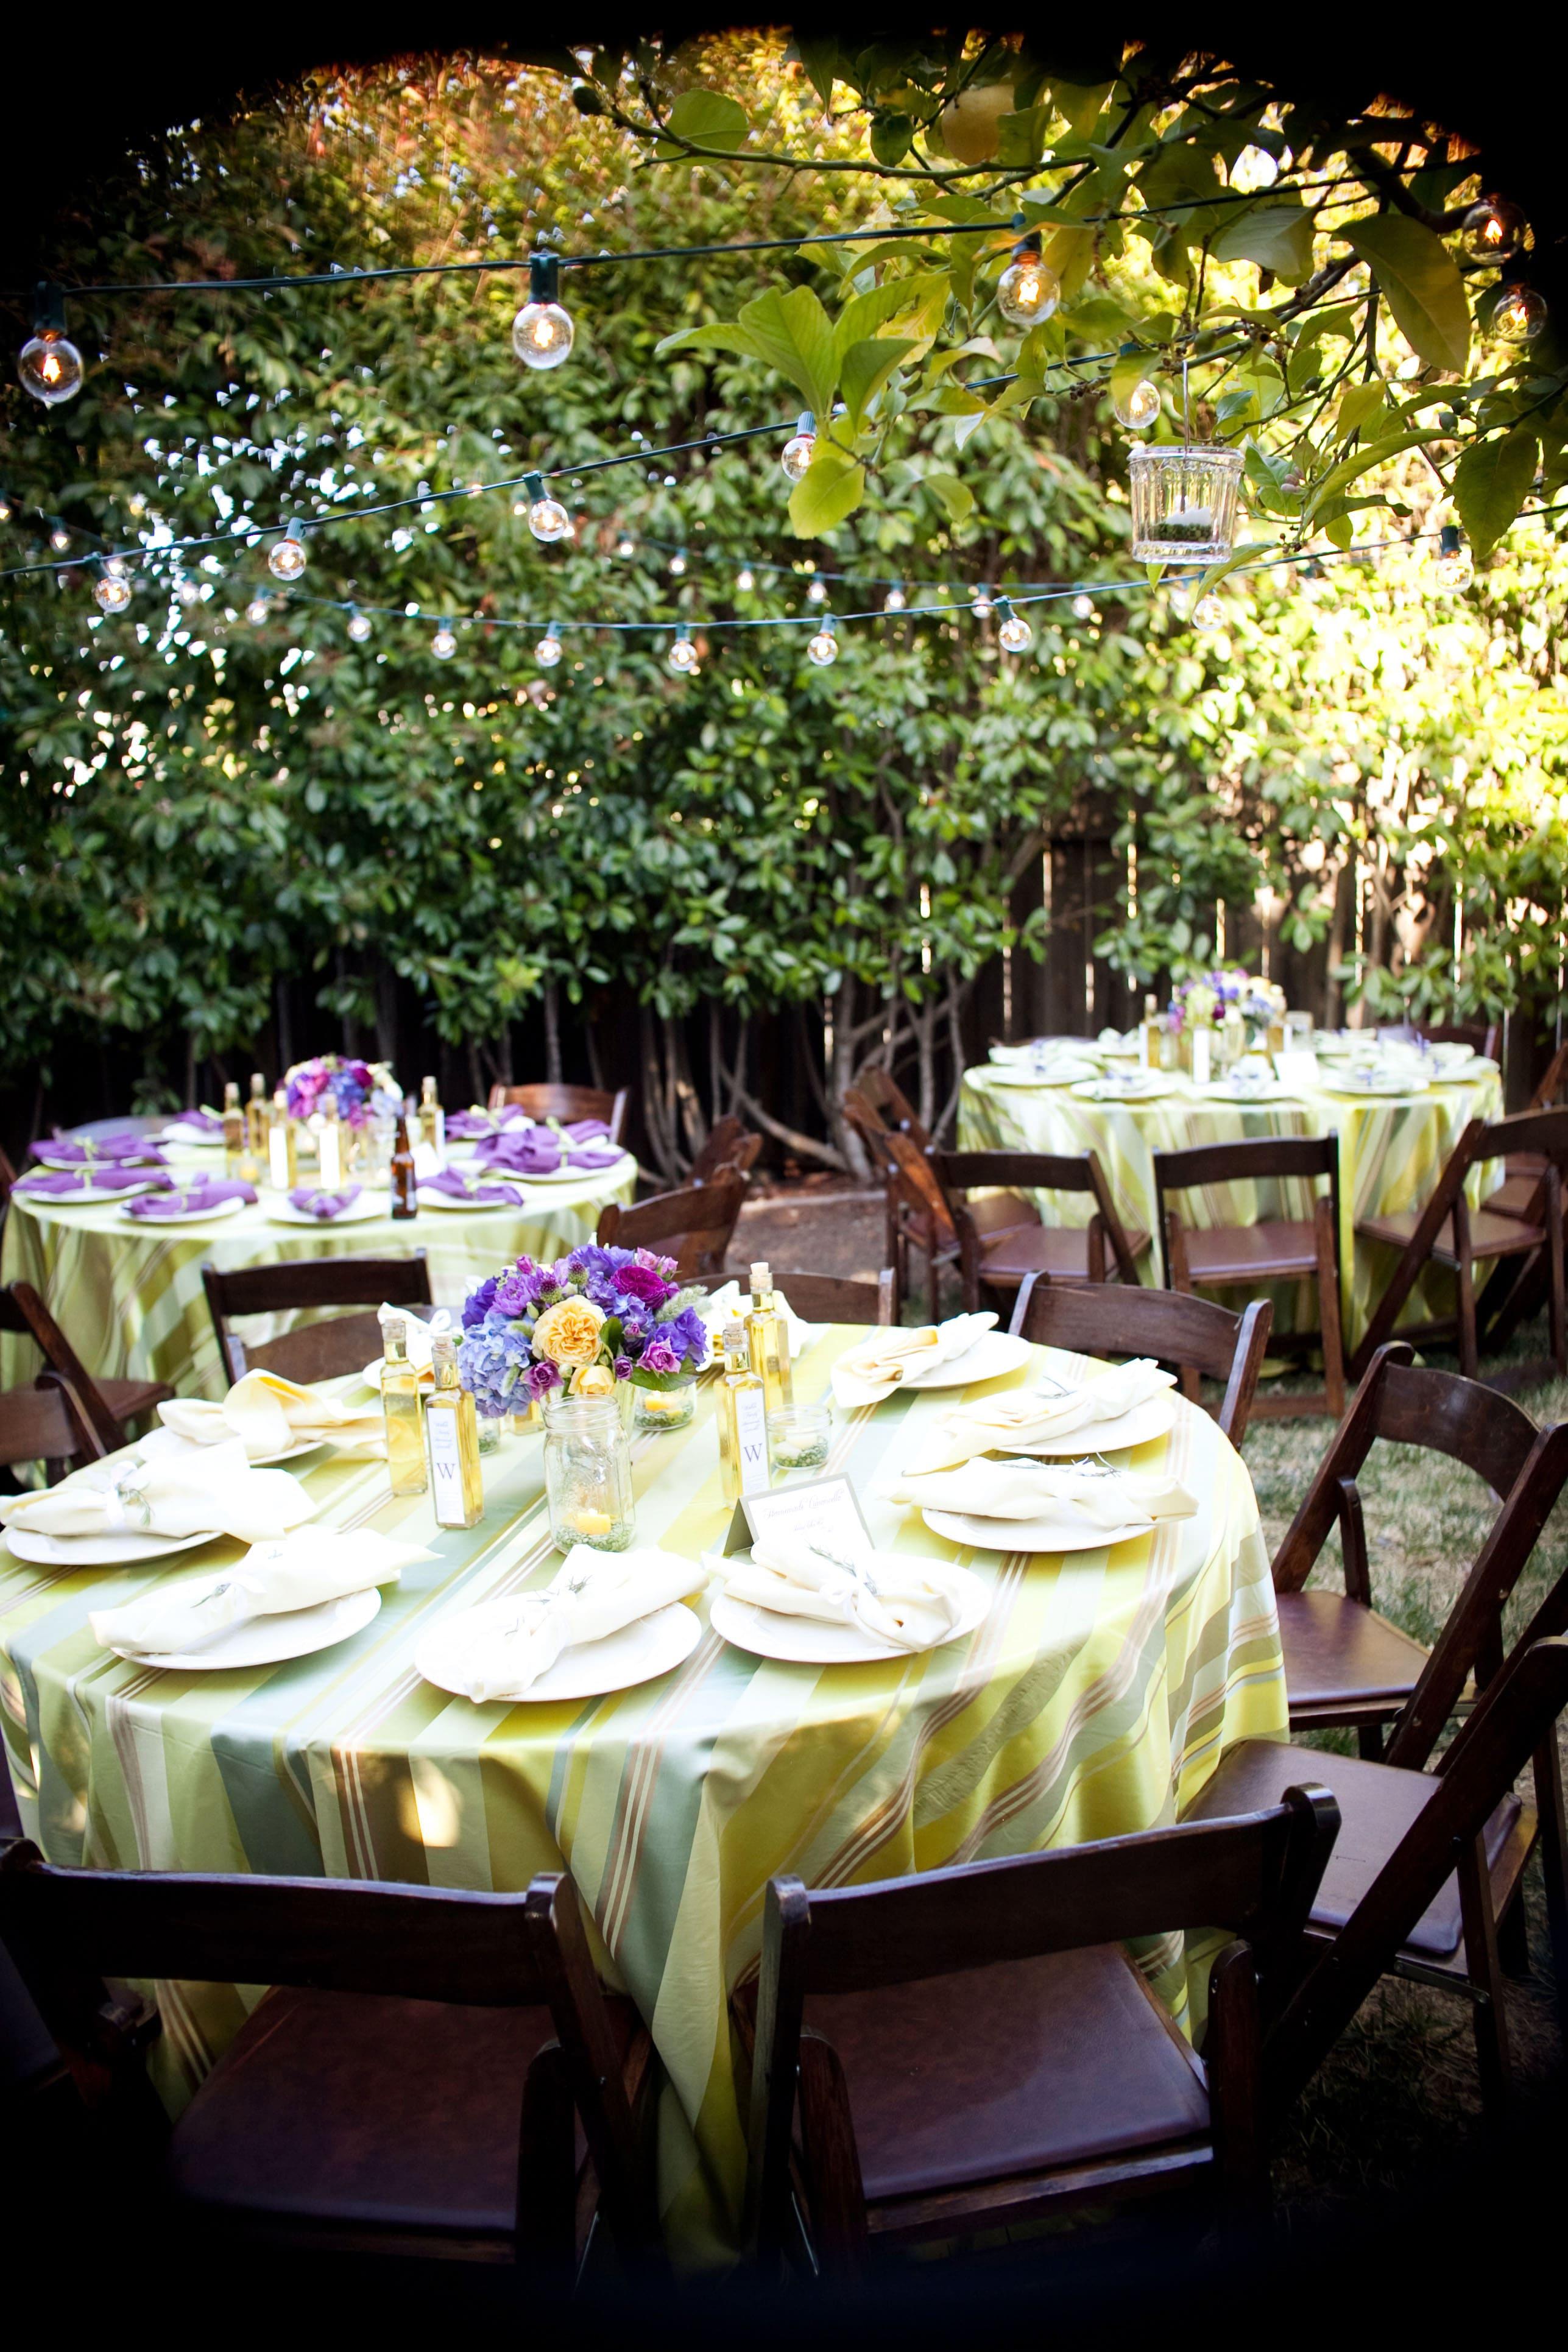 22.SIMPHOME.COM backyard bbq wedding reception outdoor furniture design ideas